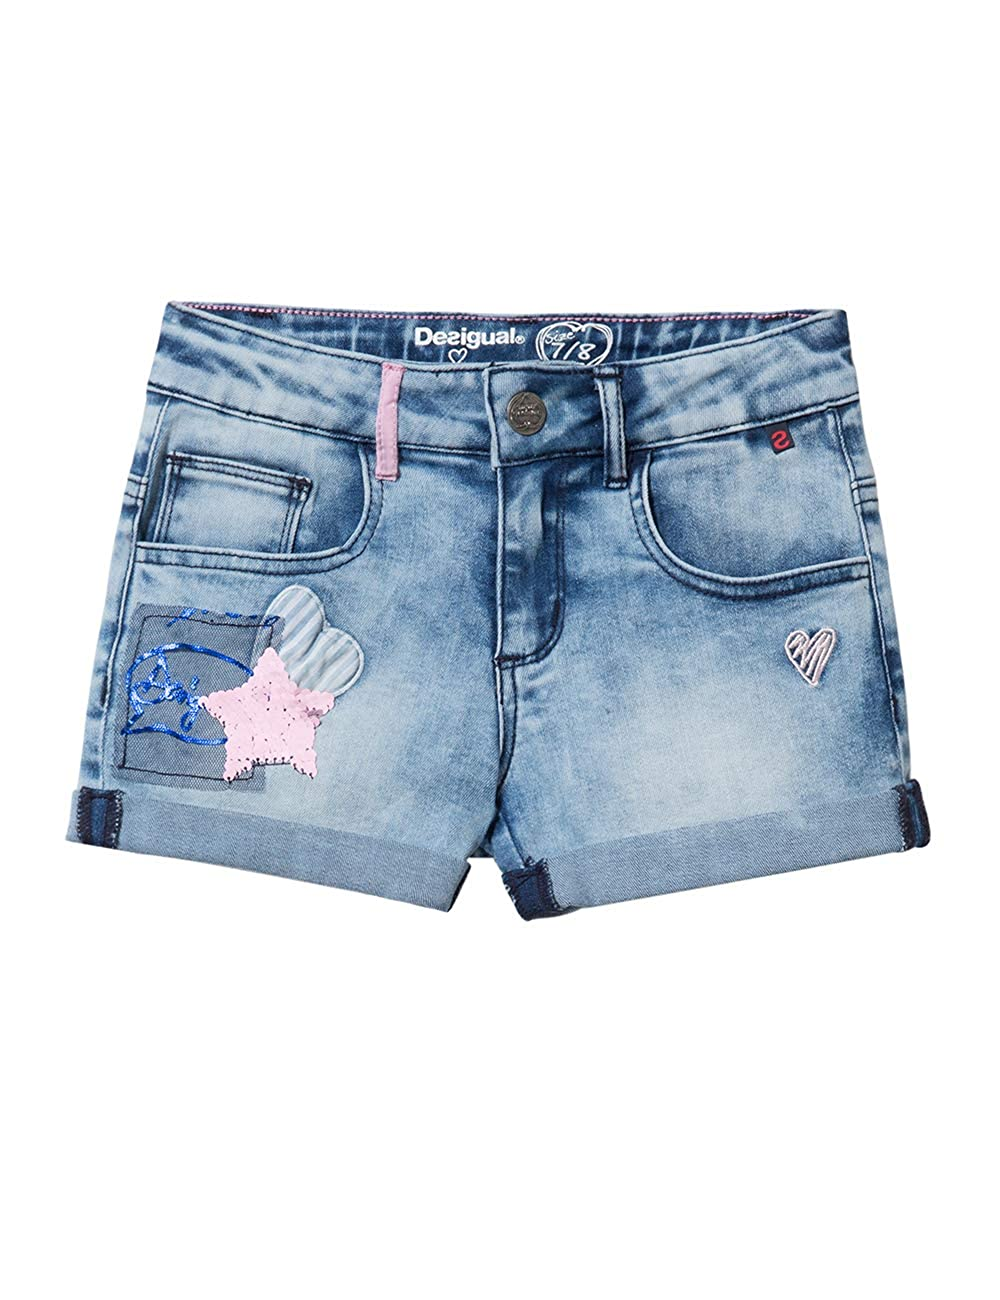 Desigual Girl Short Trousers (Denim_maestre), Pantalones ...